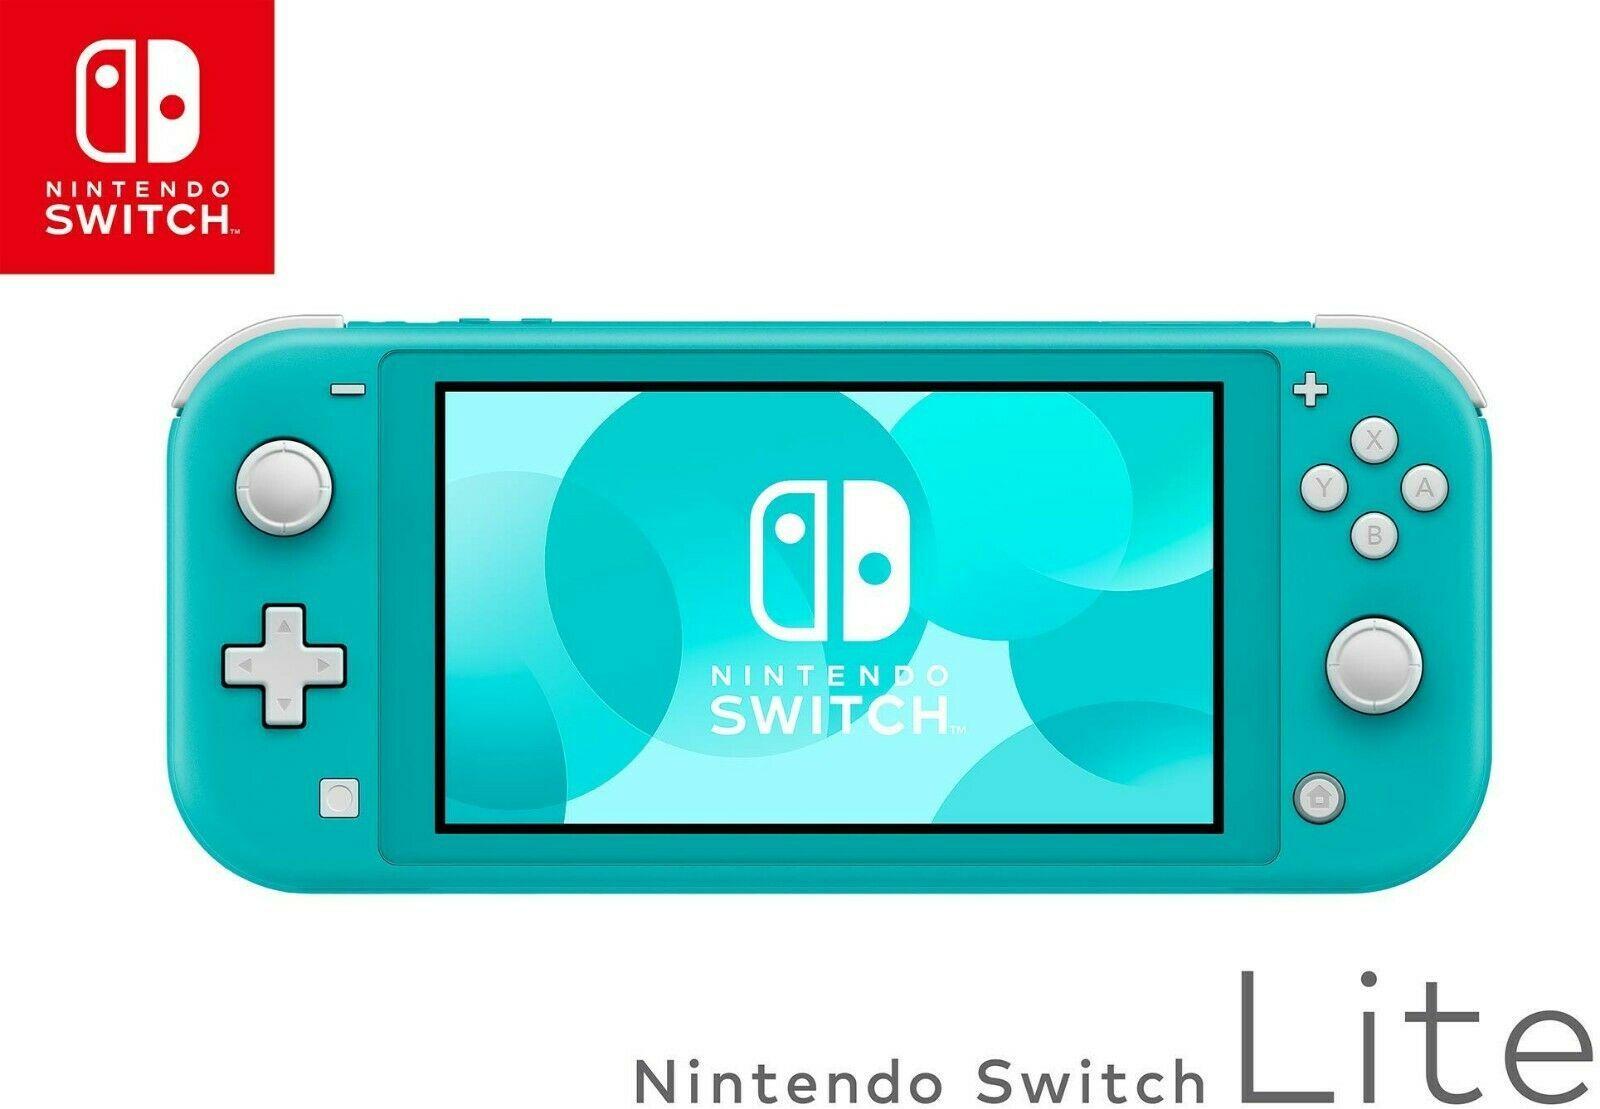 Details About Nintendo Switch Lite Compatible W All Nintendo Switch Games Optimized Nintendo Switch Nintendo Switch Games Nintendo Switch System